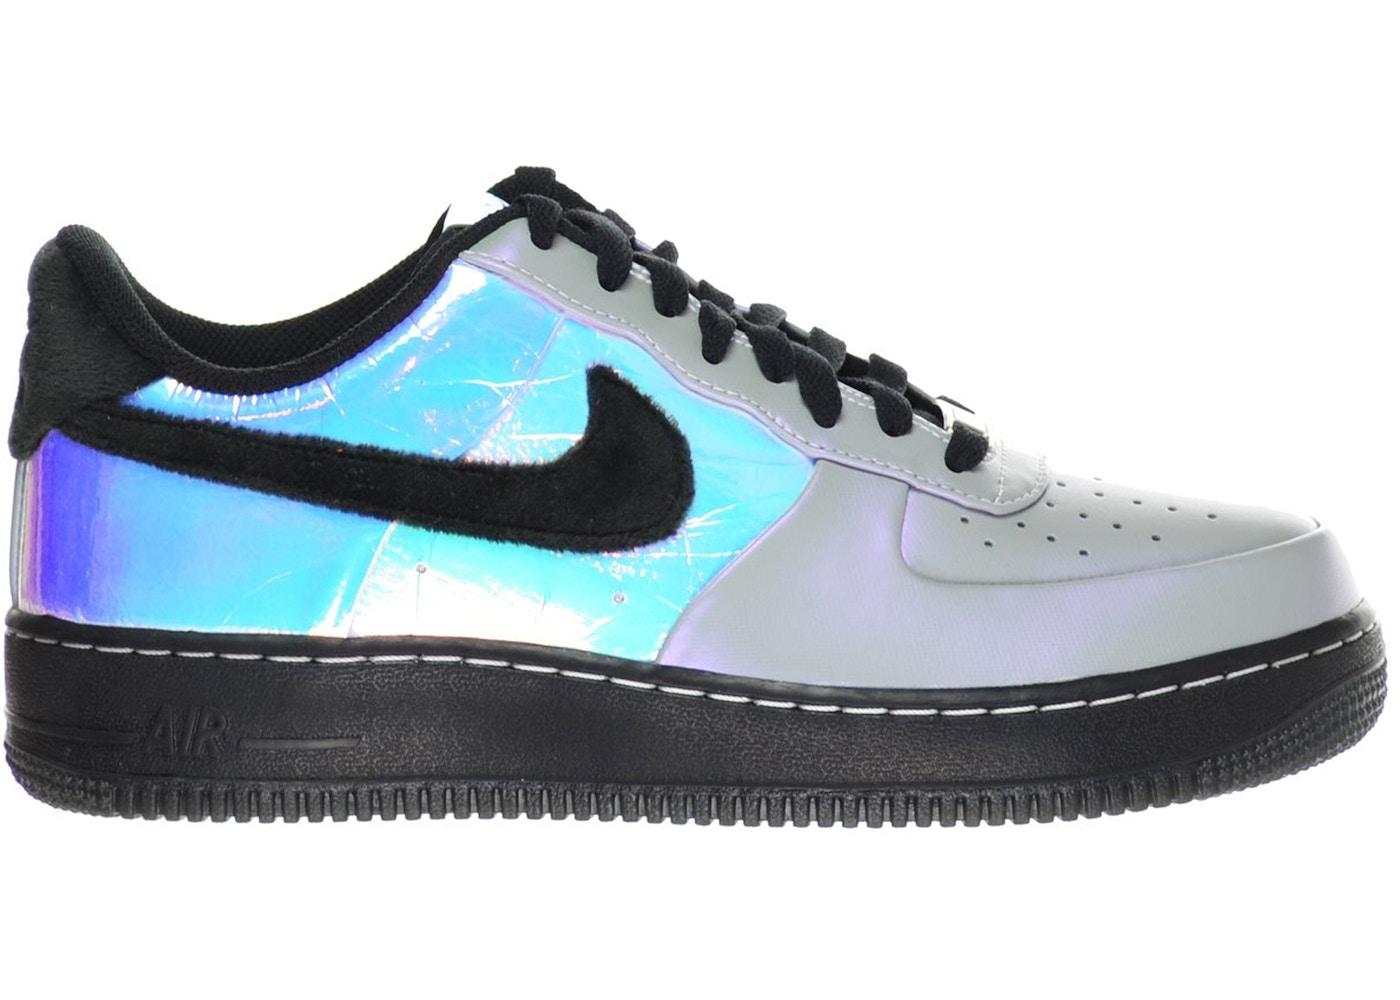 Nike Air Force 1 Low CMFT Hologram - 579941-101